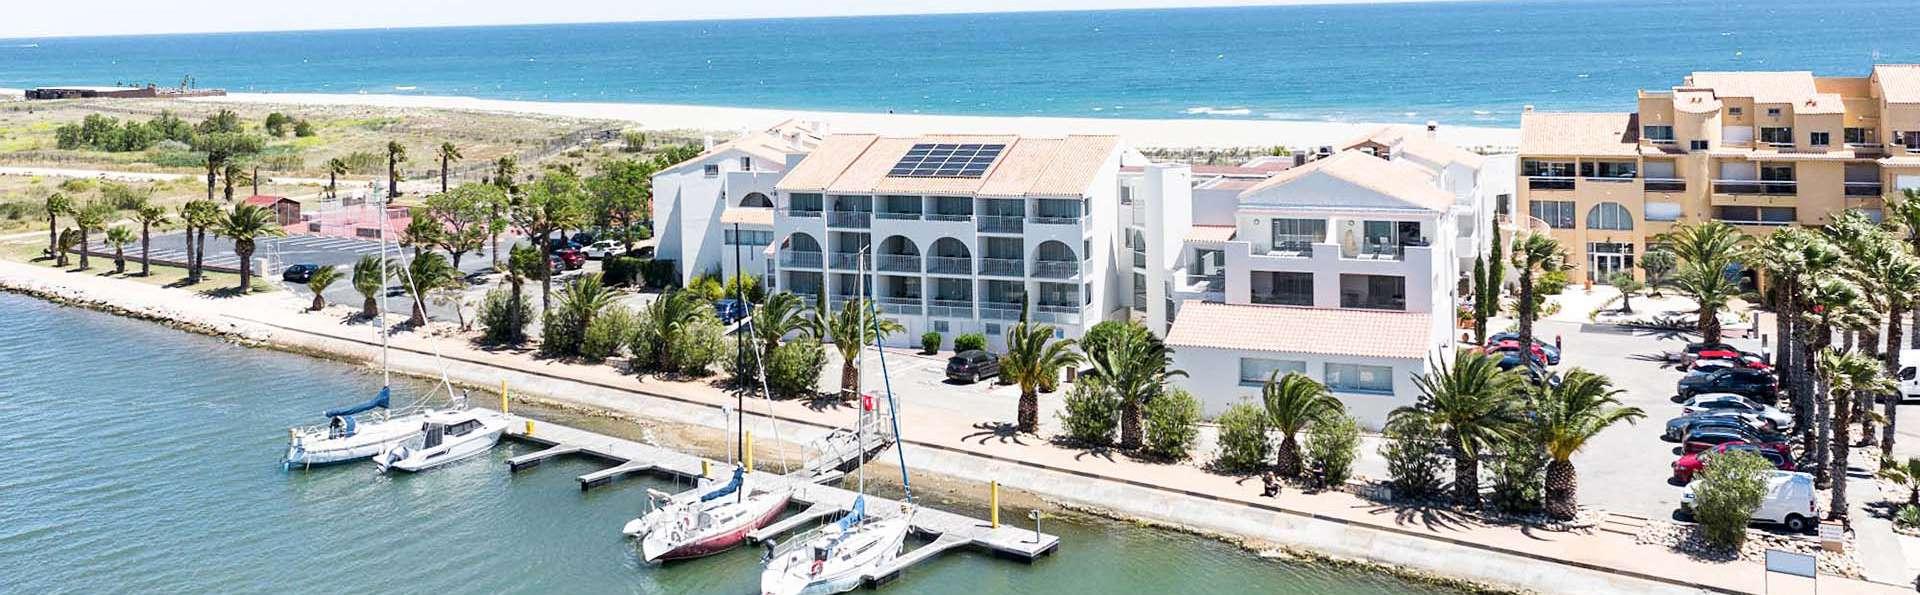 Les Bulles de Mer - EDIT_photo-arienne---facade-lagune_01.jpg